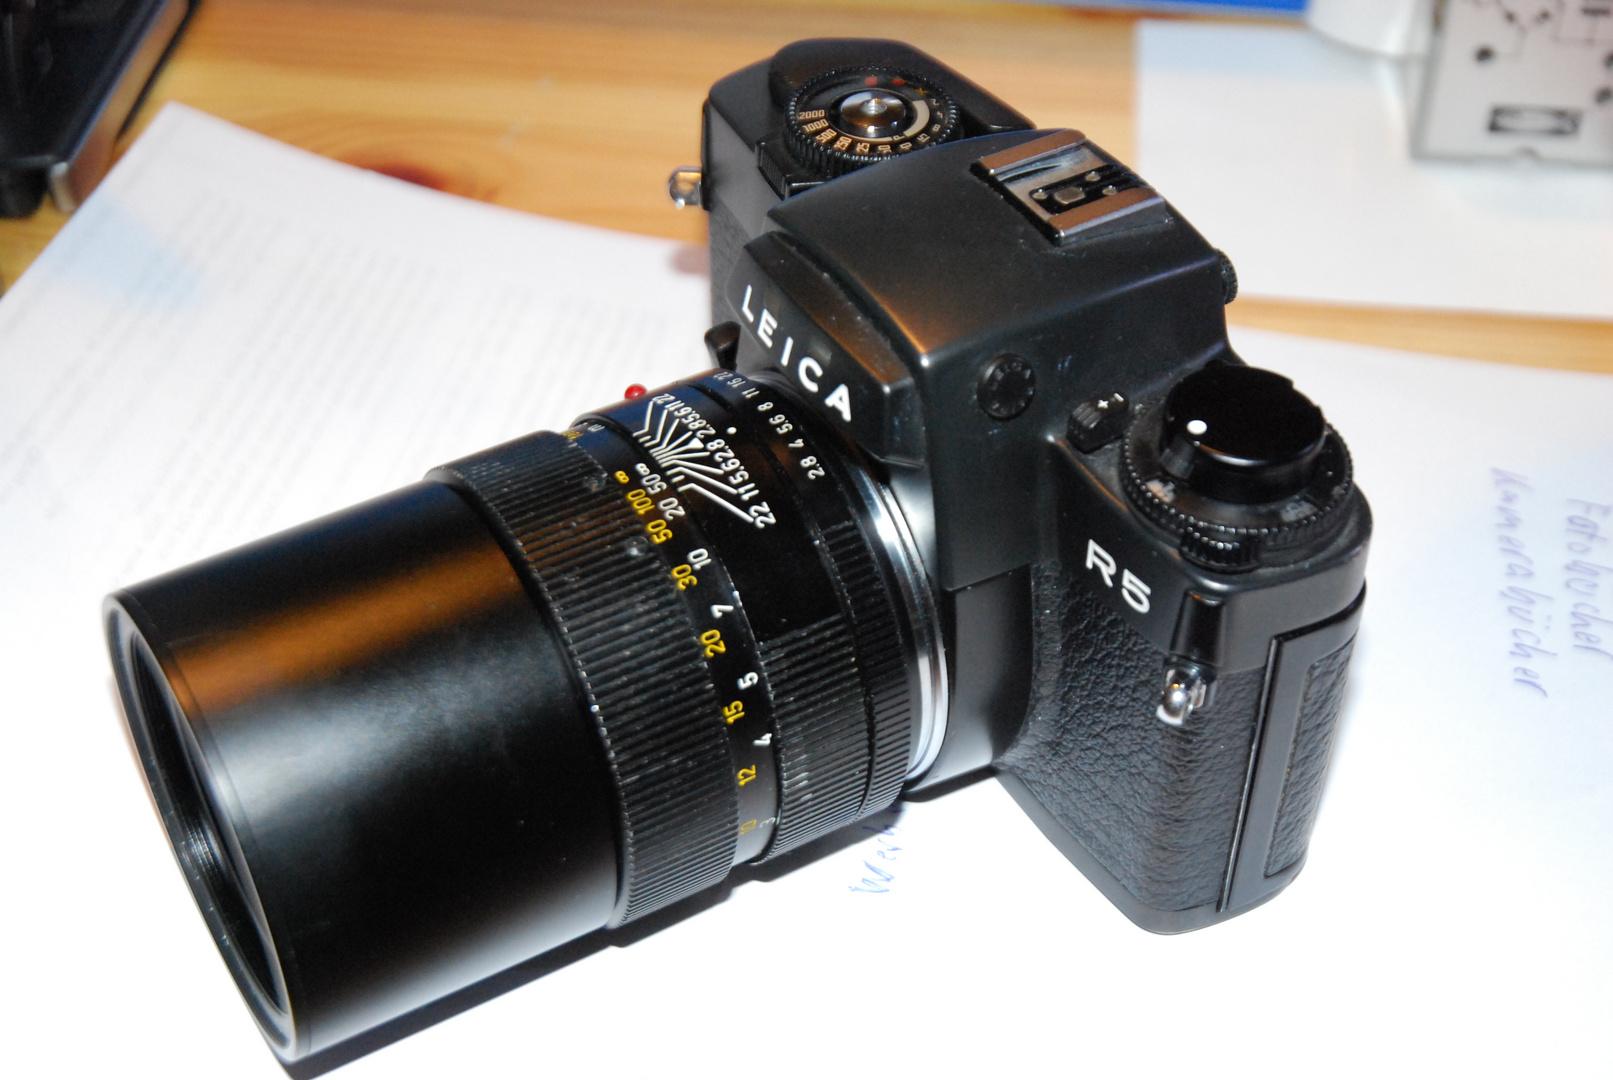 Meine Leica R5